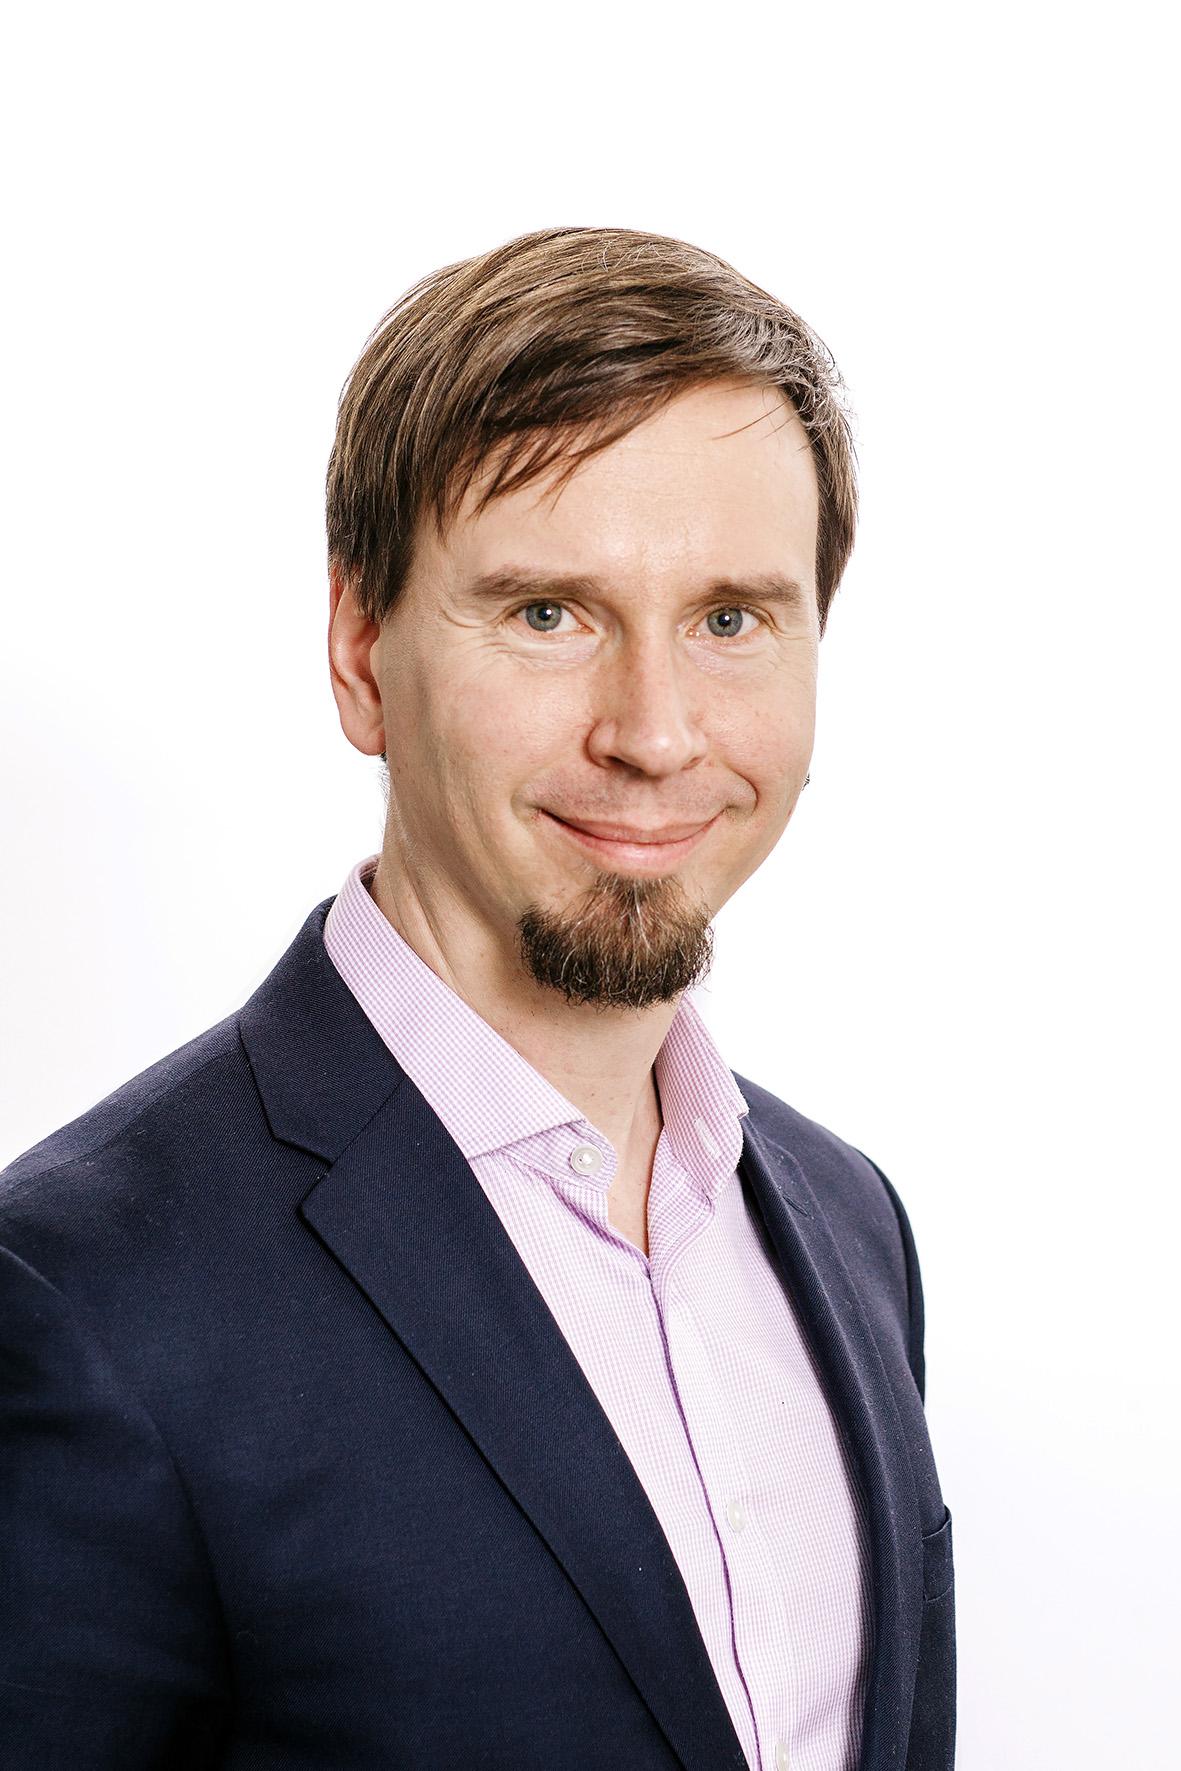 Tuomas Ylä-Anttila